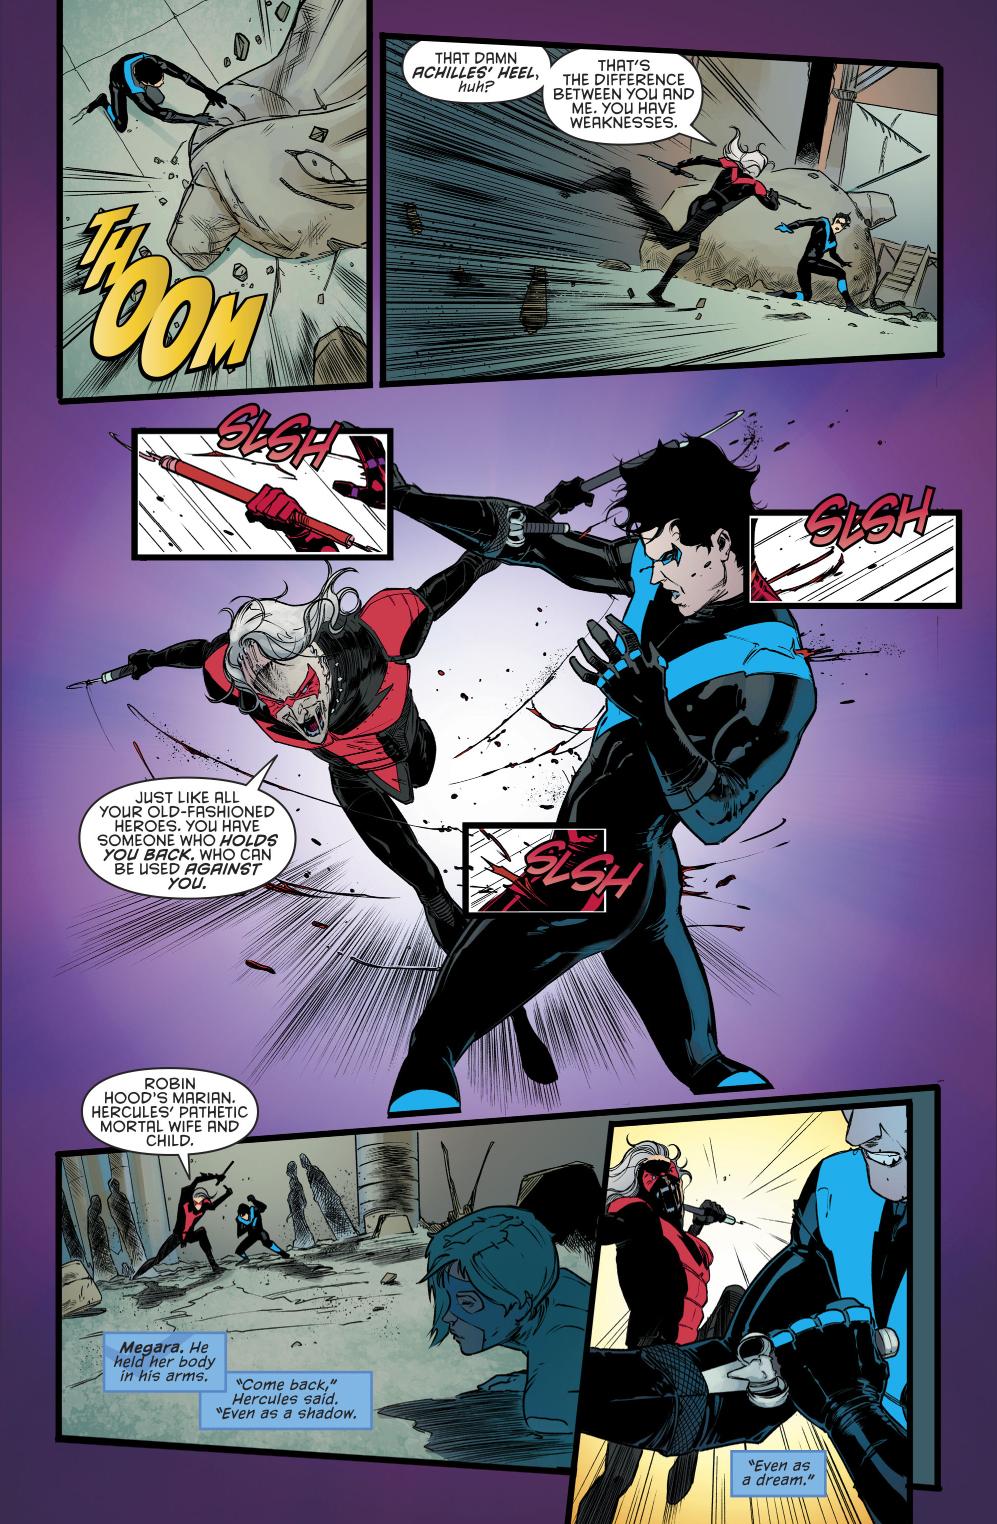 Nightwing VS Deathwing (rebirth)